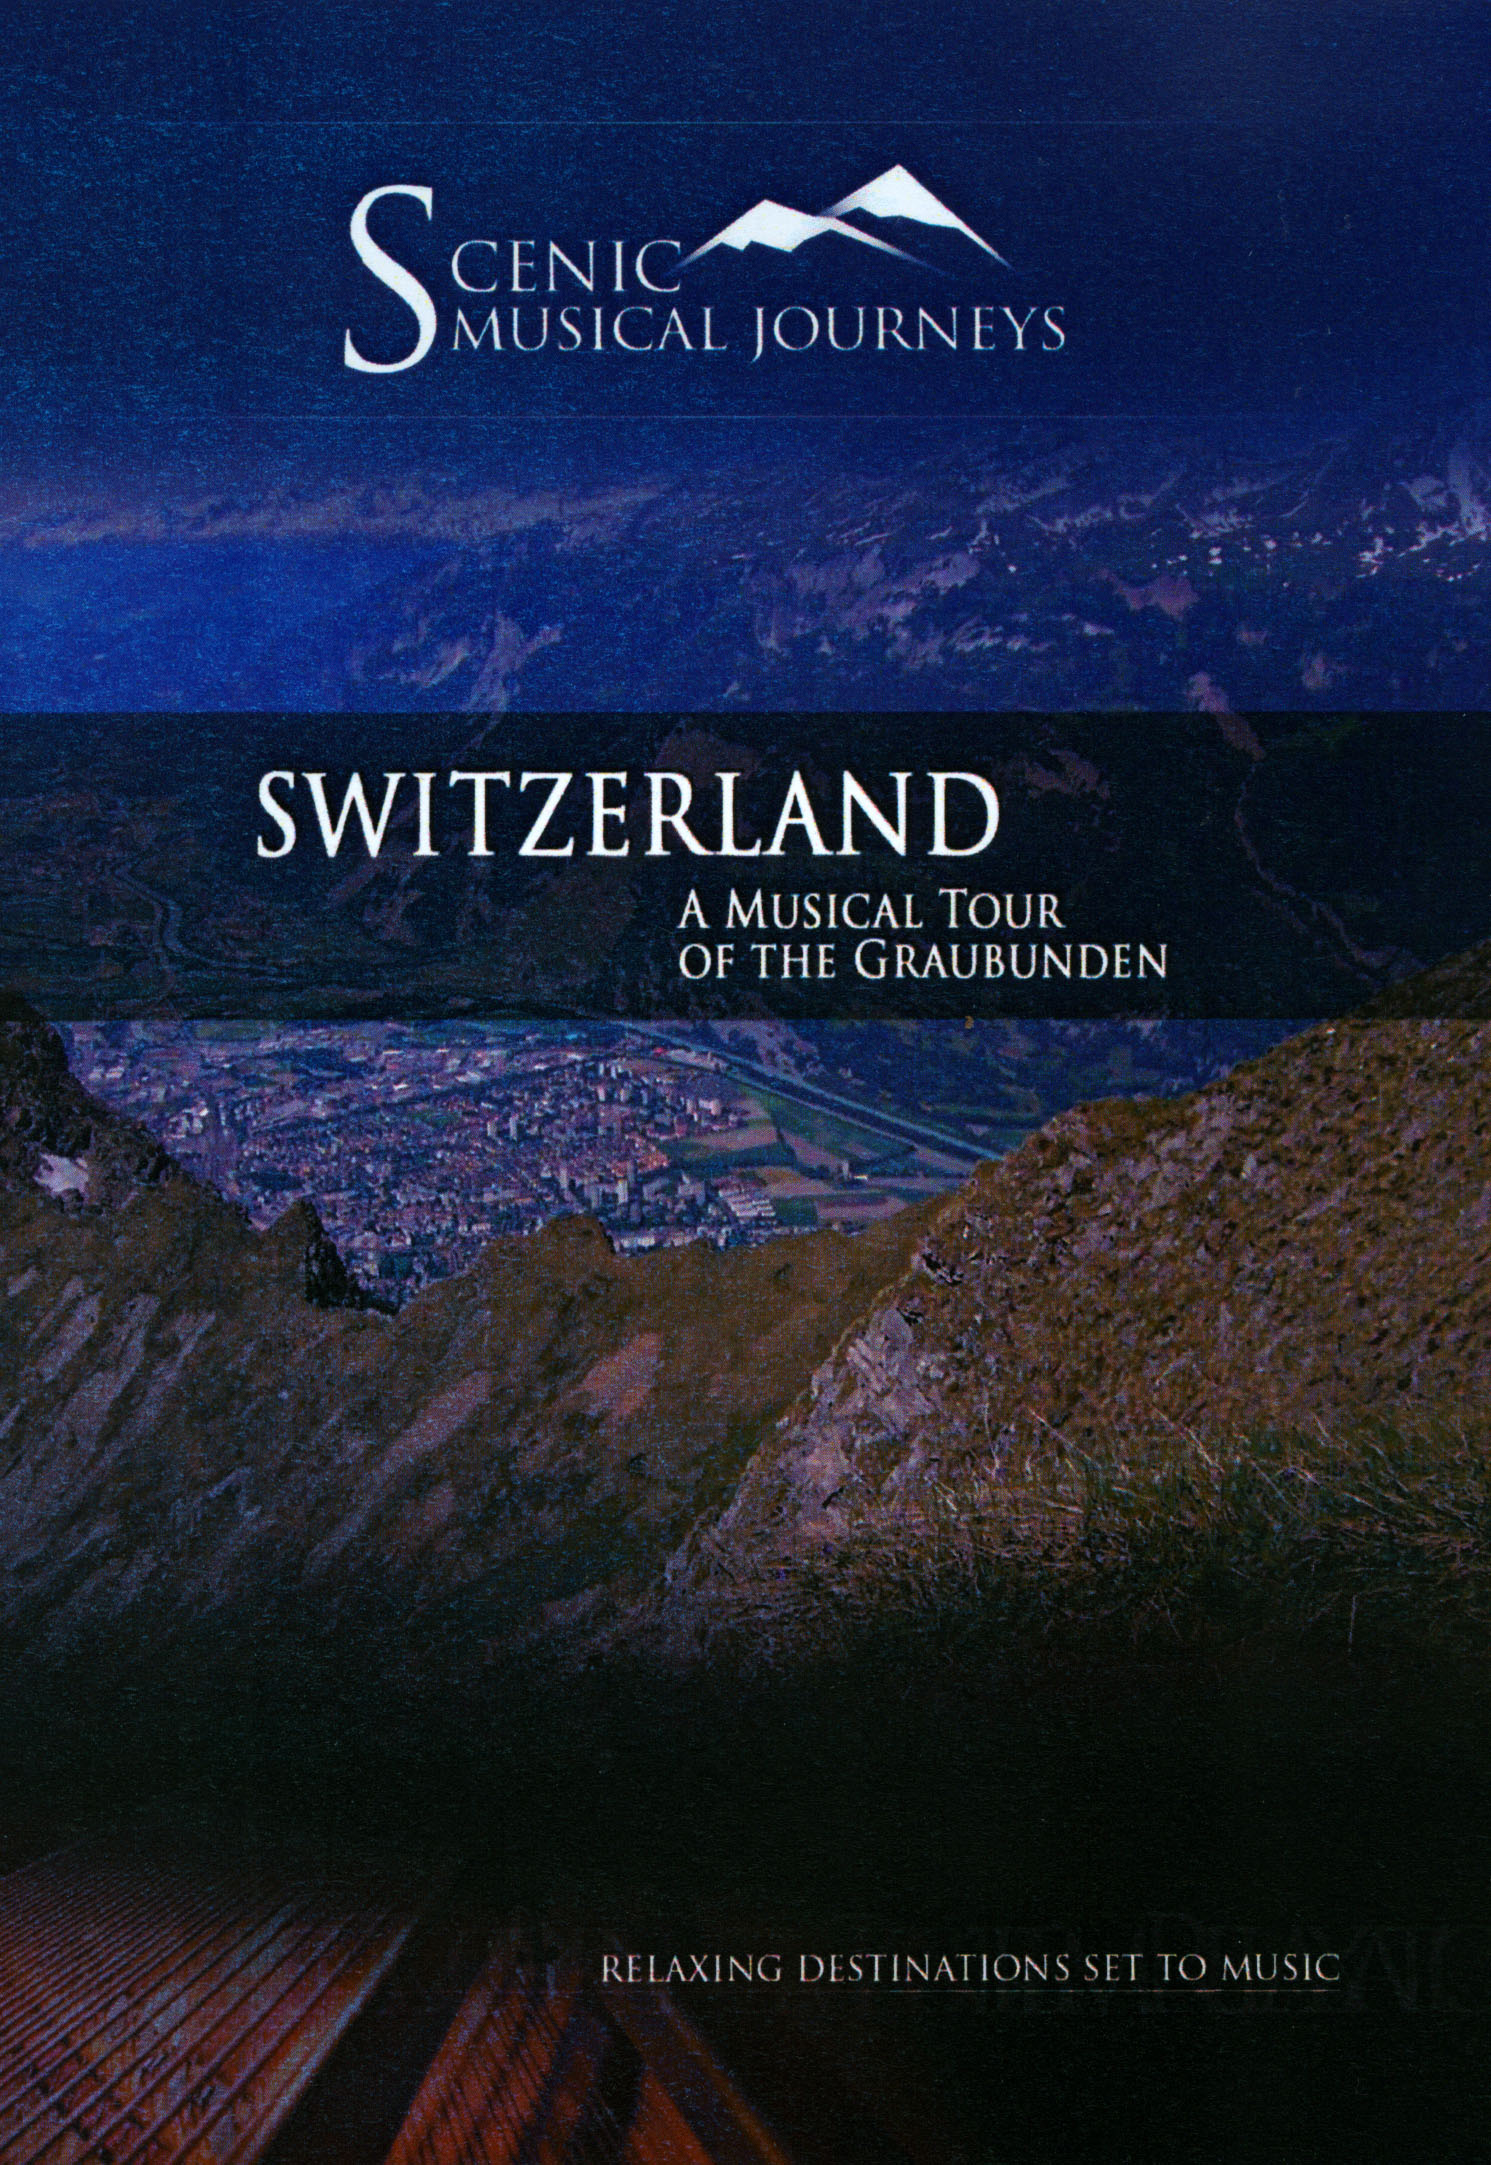 Scenic Musical Journeys: Switzerland - A Music Tour of the Graubunden